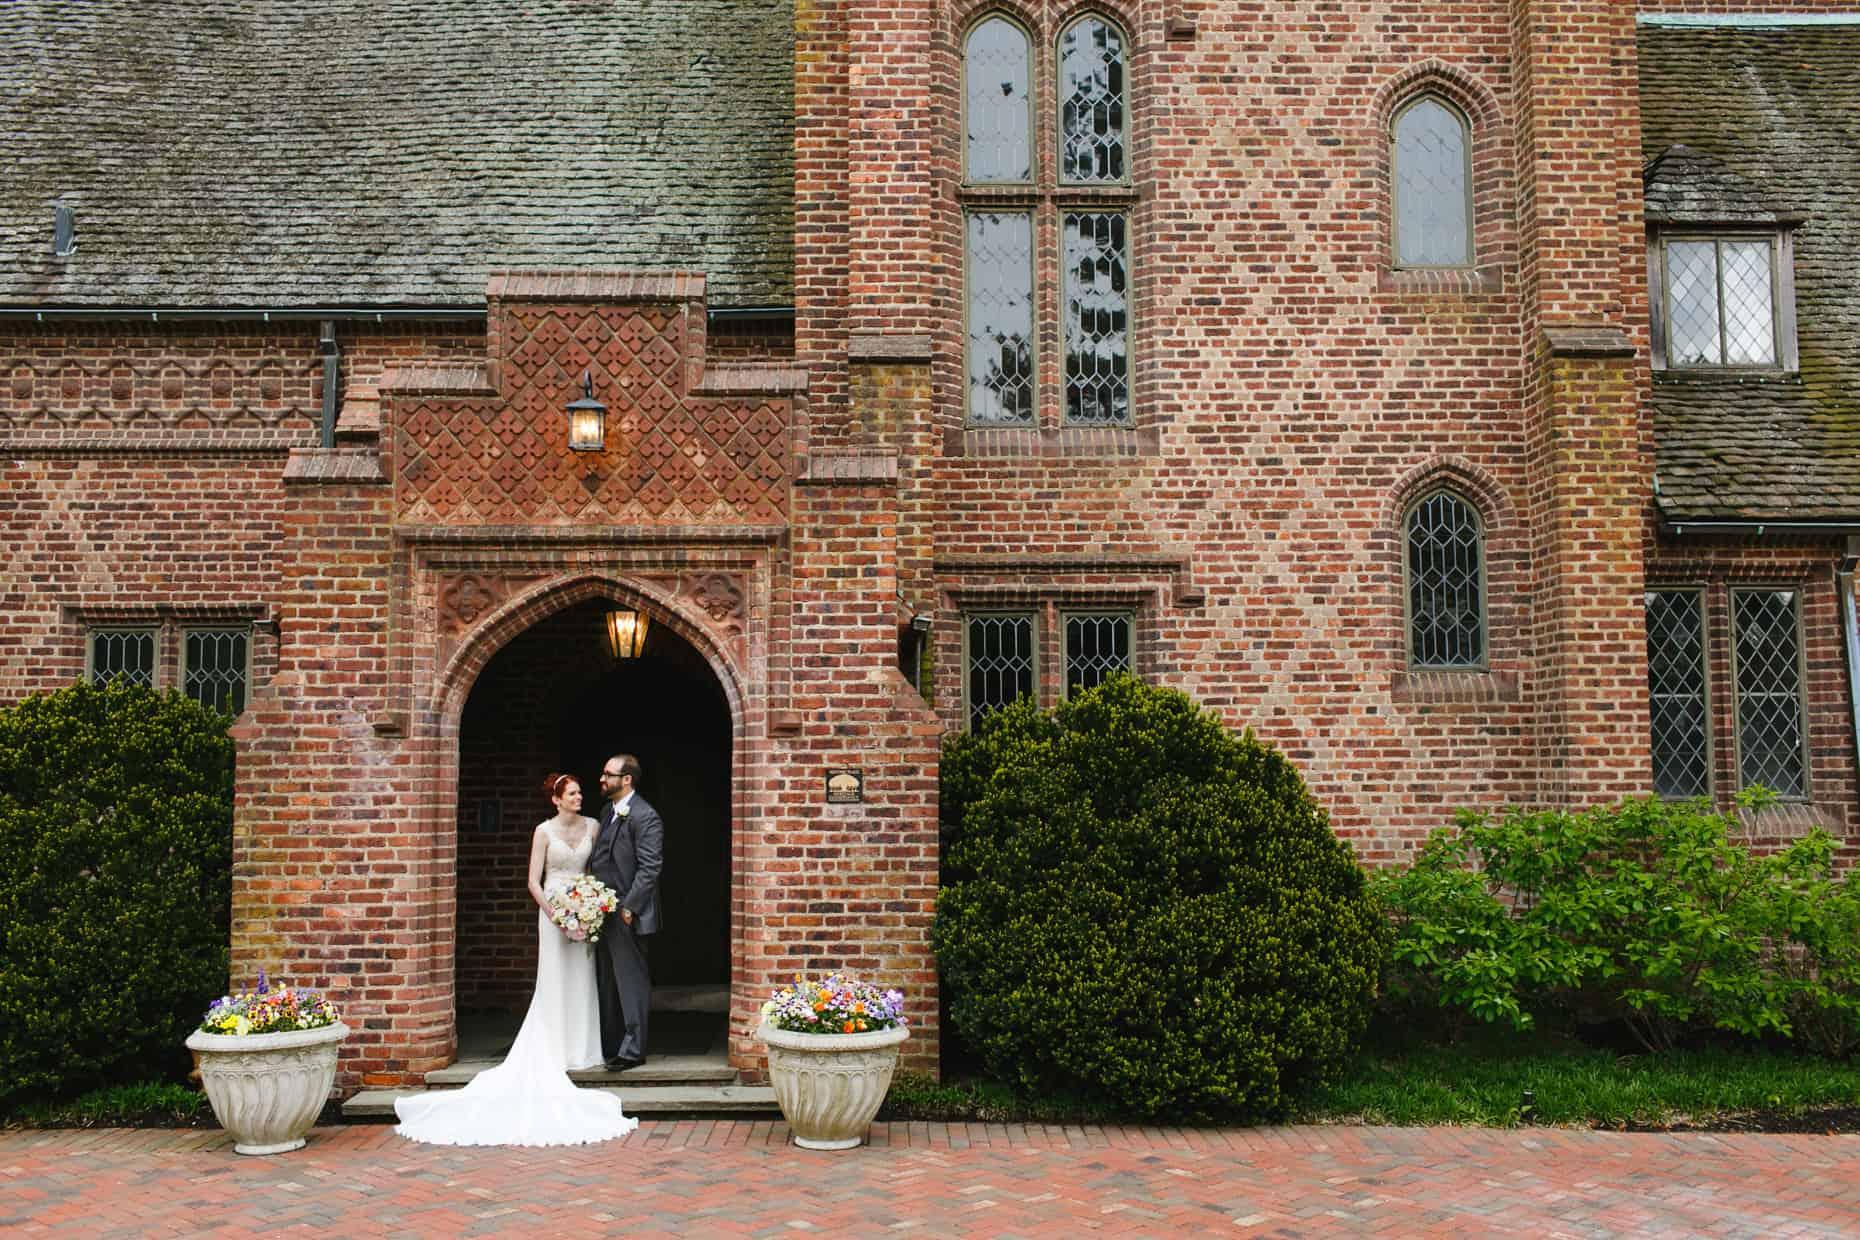 Bucks County Wedding Ceremony